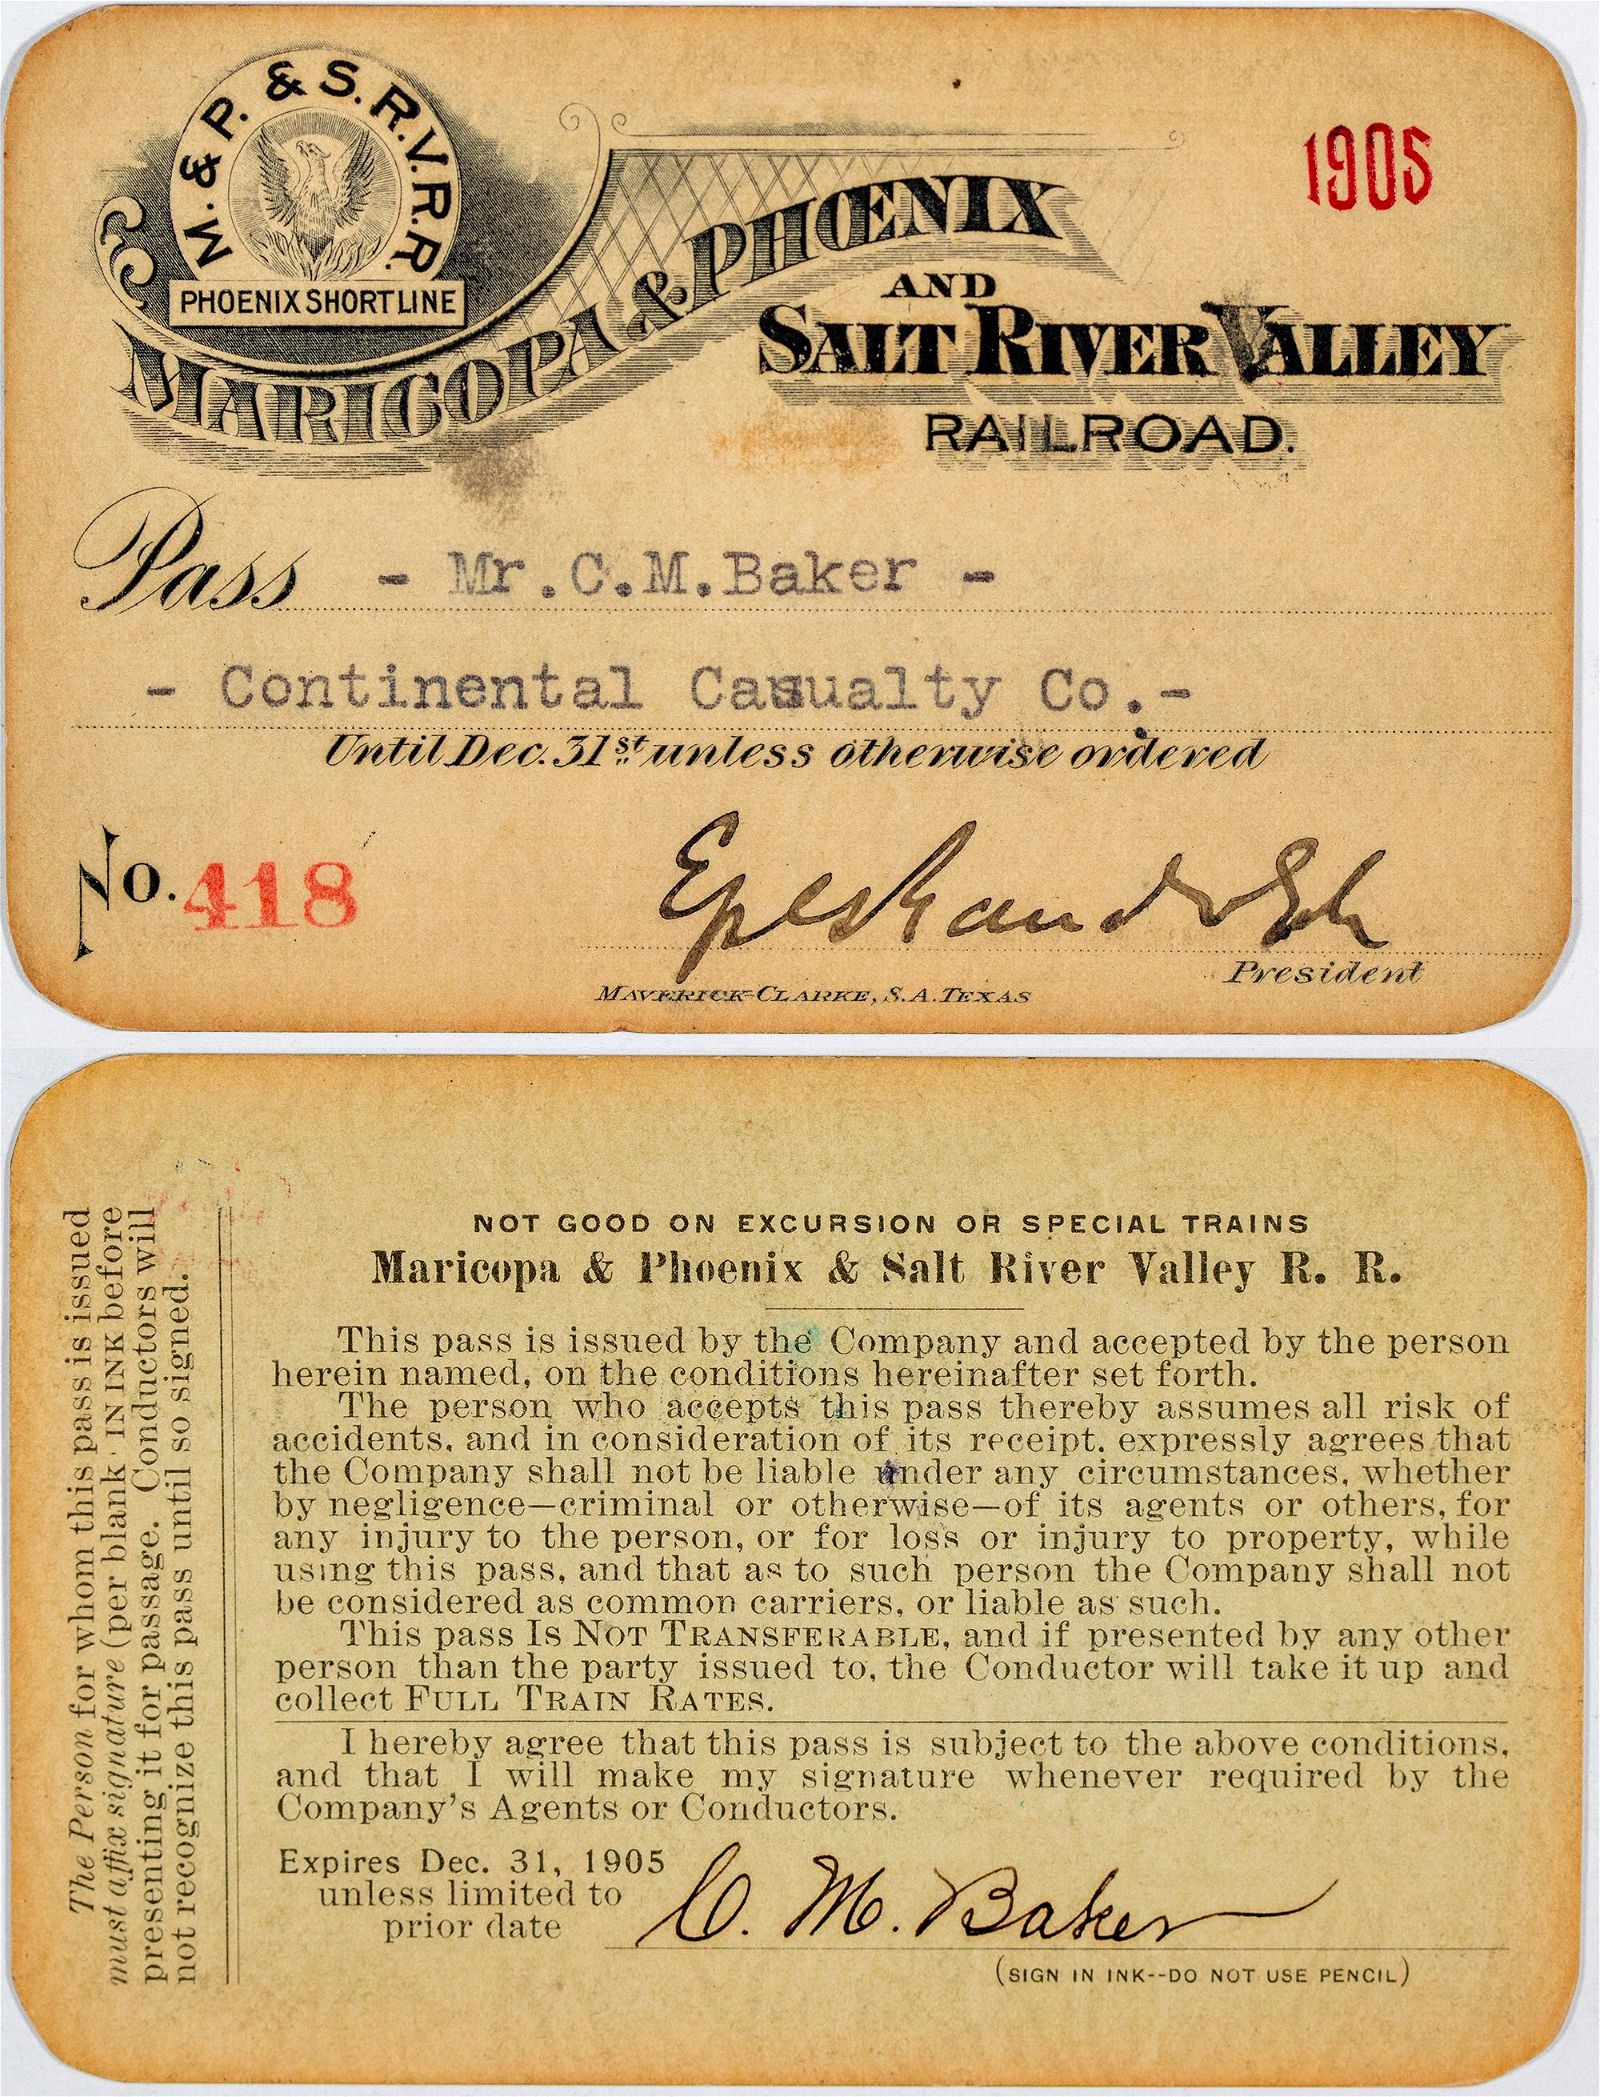 Maricopa & Phoenix and Salt River Valley Railroad Pass